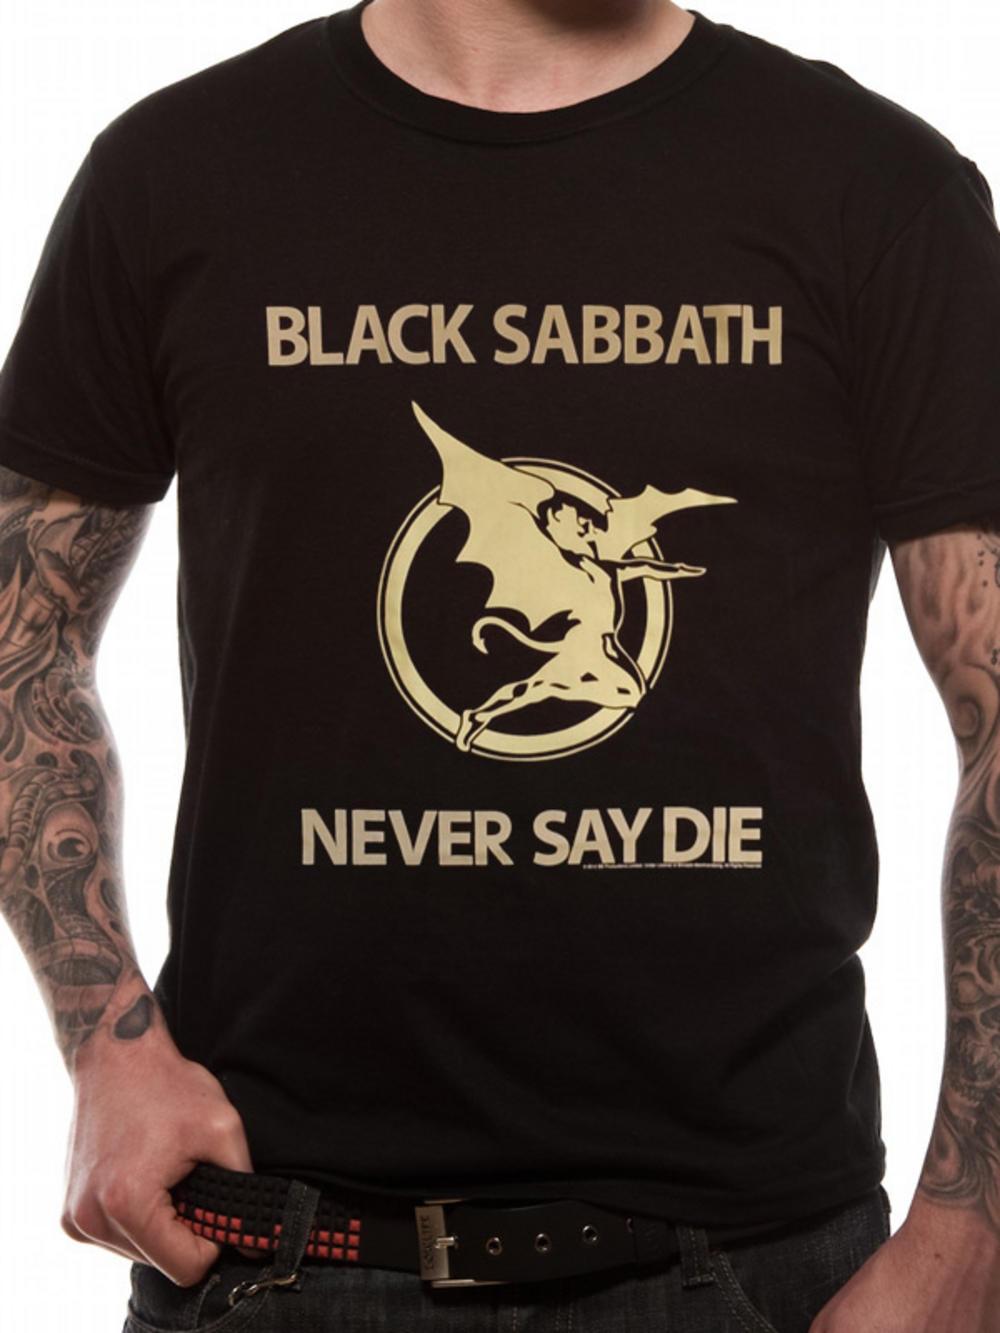 Black Sabbath (Never Say Die) T-Shirt